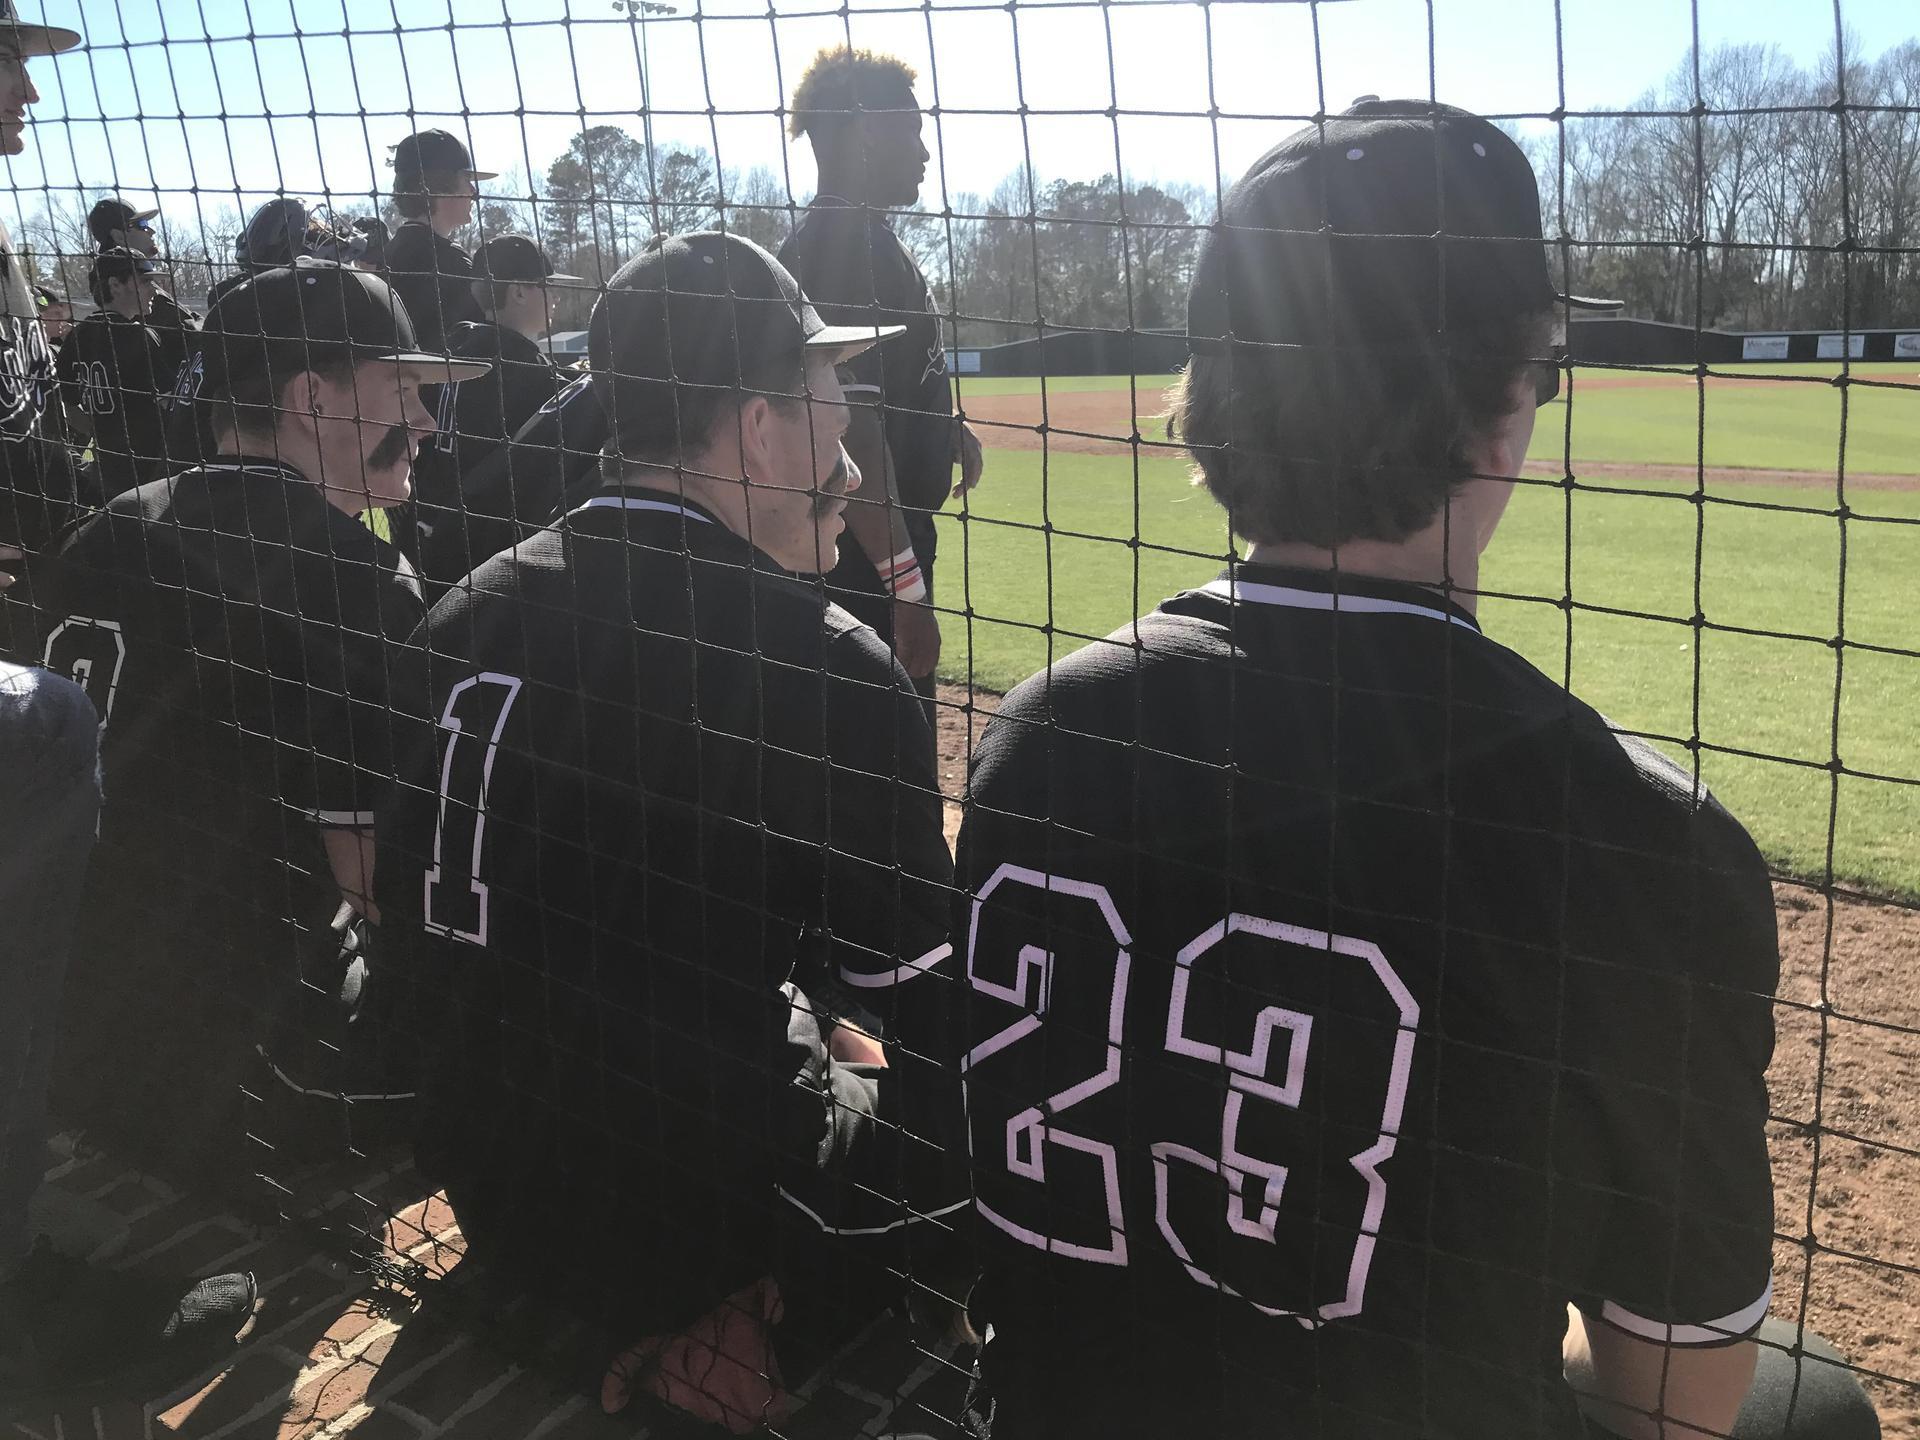 WLHS Baseball Team Game Action